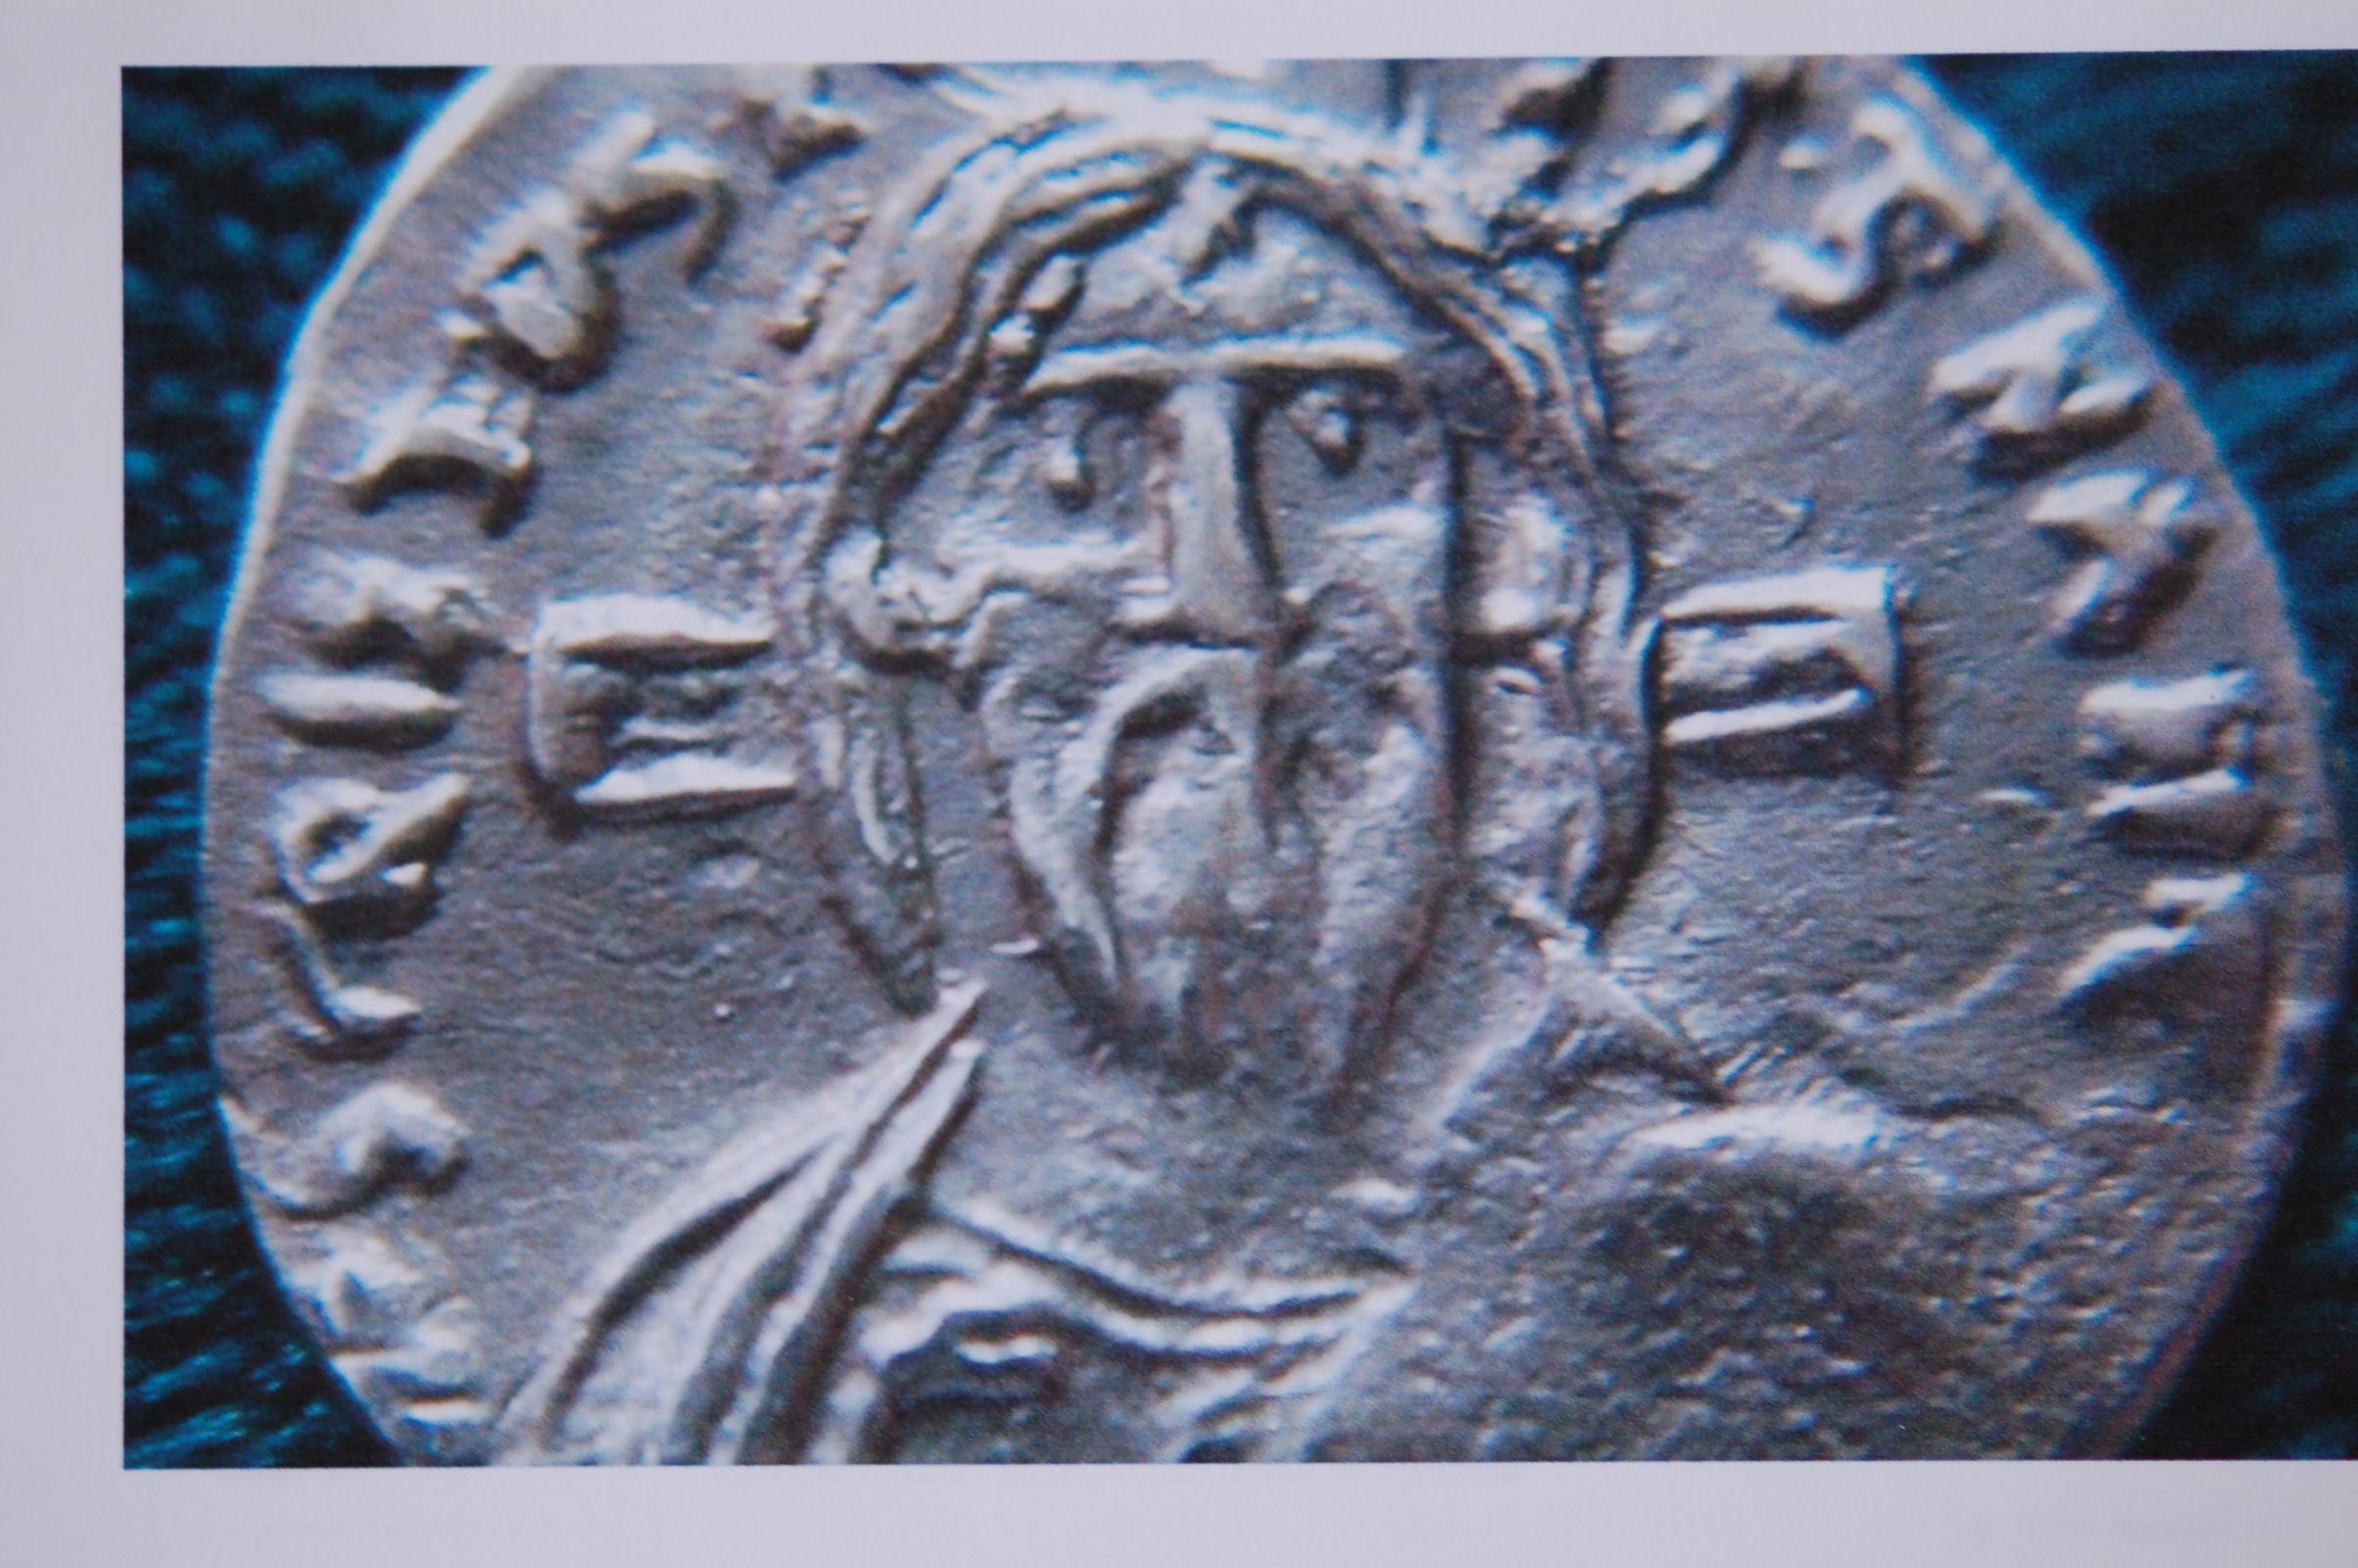 Photo 29. Solidus coin Justinianus